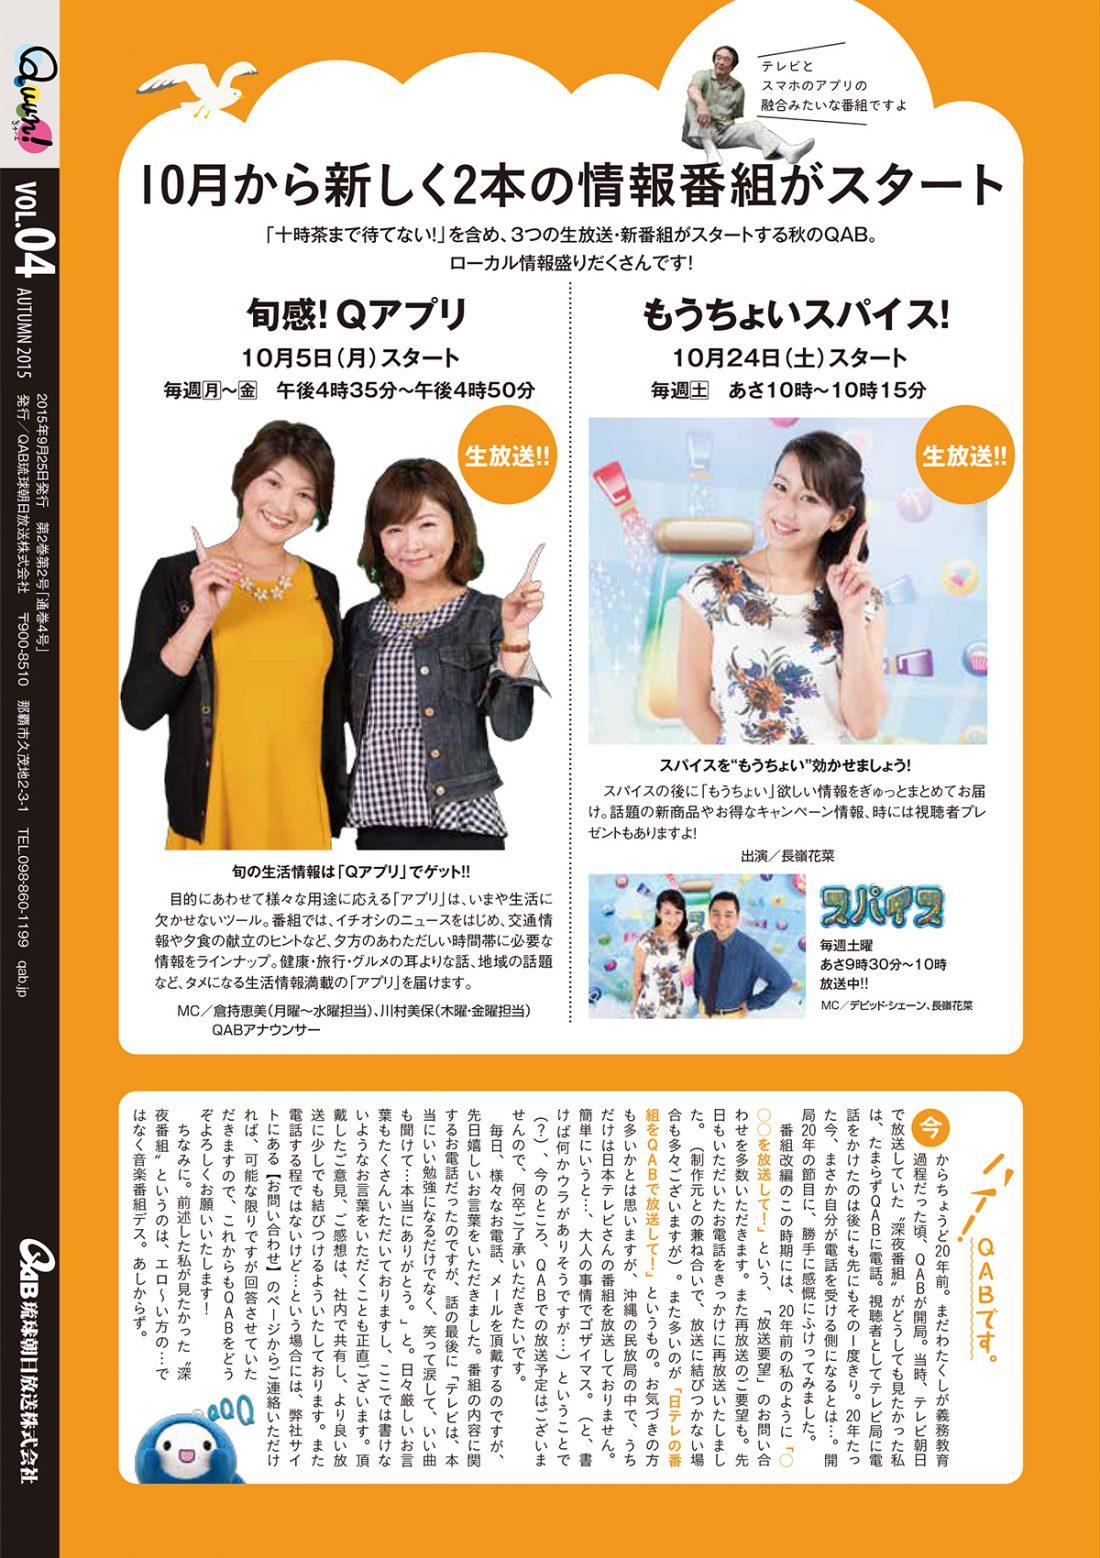 https://www.qab.co.jp/qgoro/wp-content/uploads/quun_0416-1100x1558.jpg